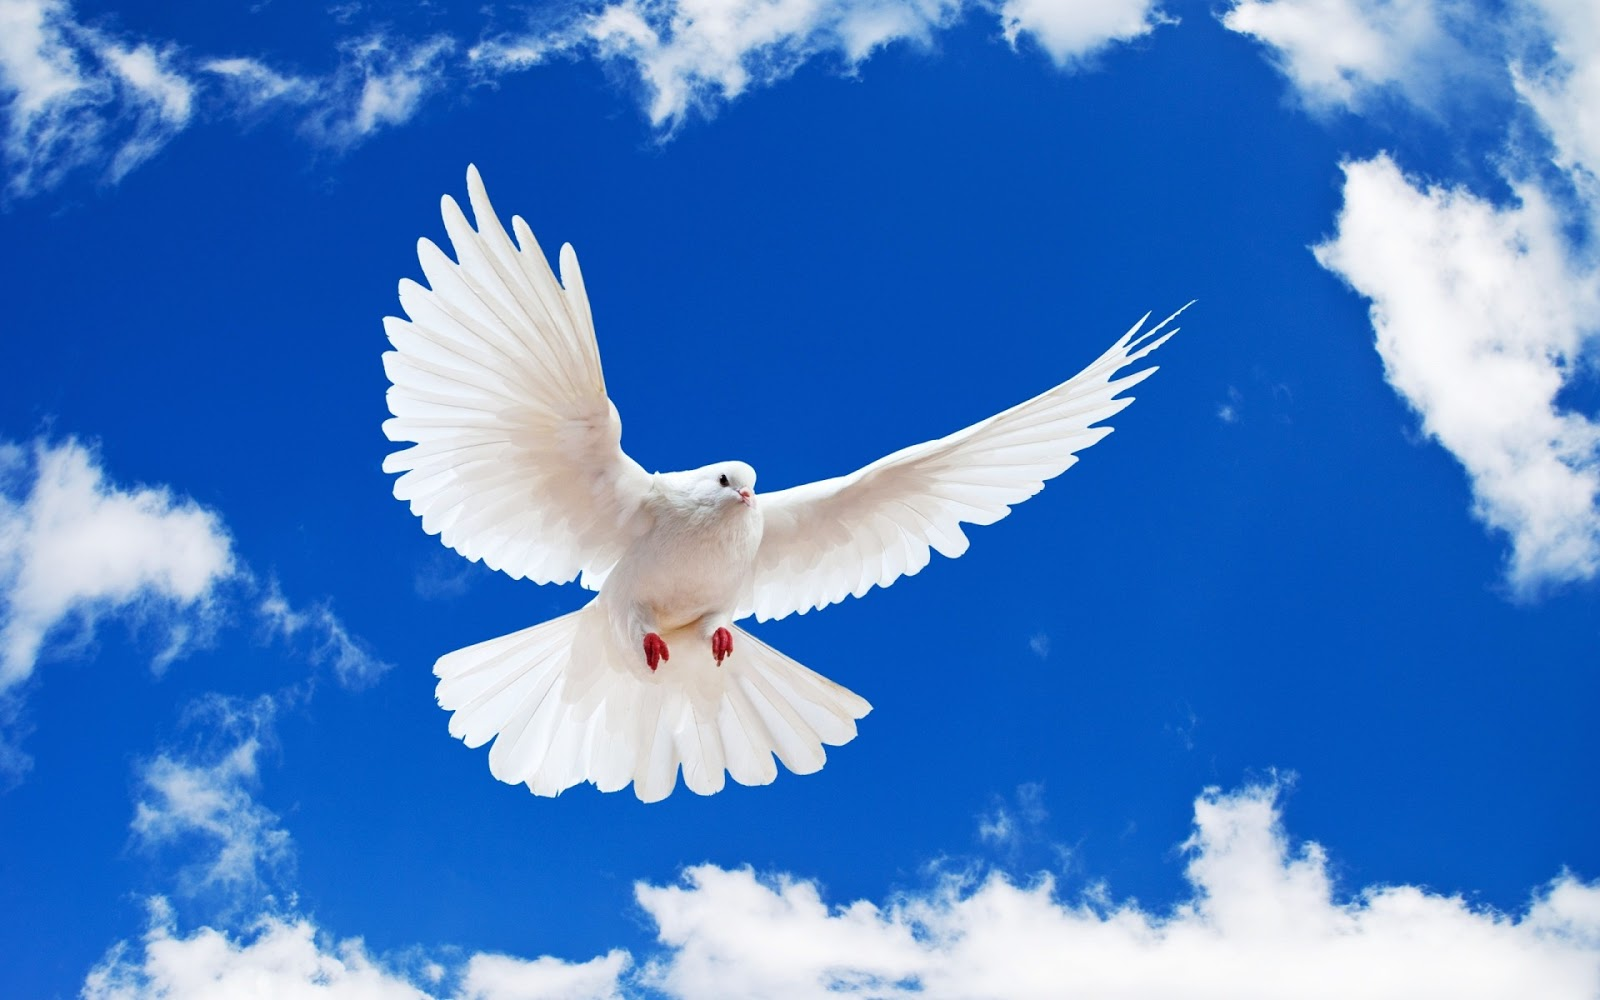 hd-achtergrond-met-witte-duif-en-blauwe-lucht.jpg